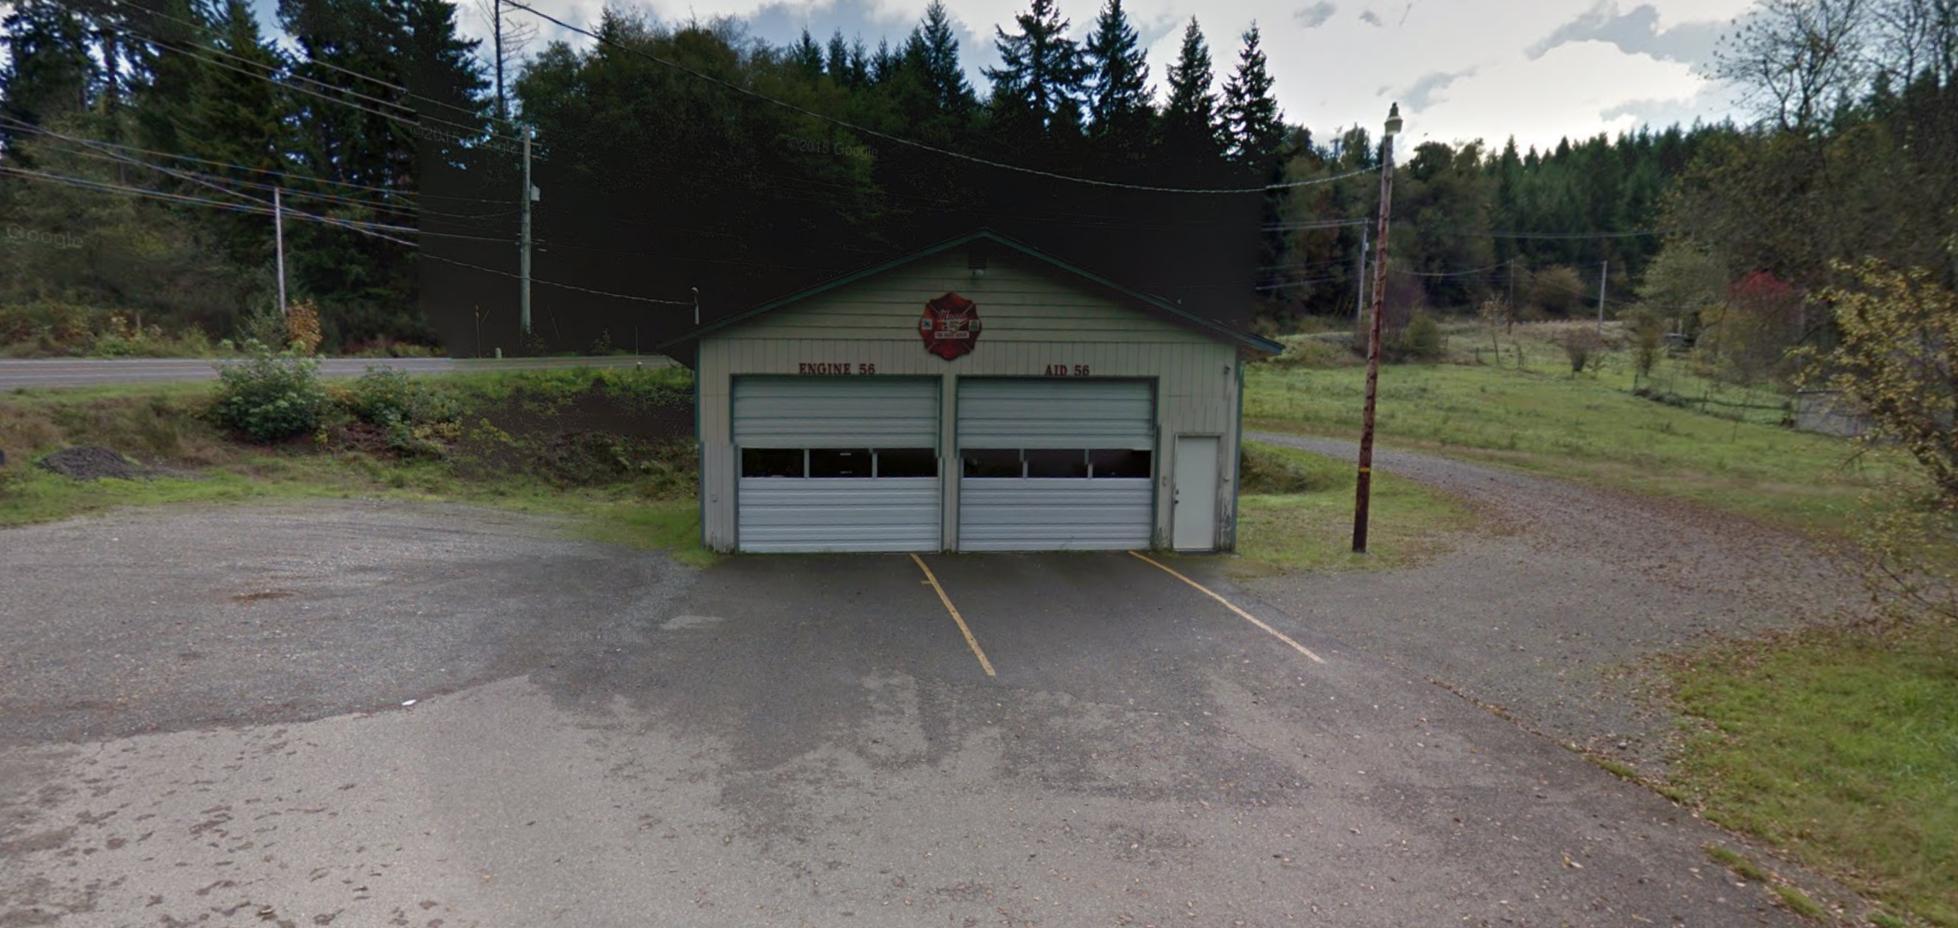 Station 5-6 - Deer Creek Fire Station  21 E Gosser Rd, Shelton WA